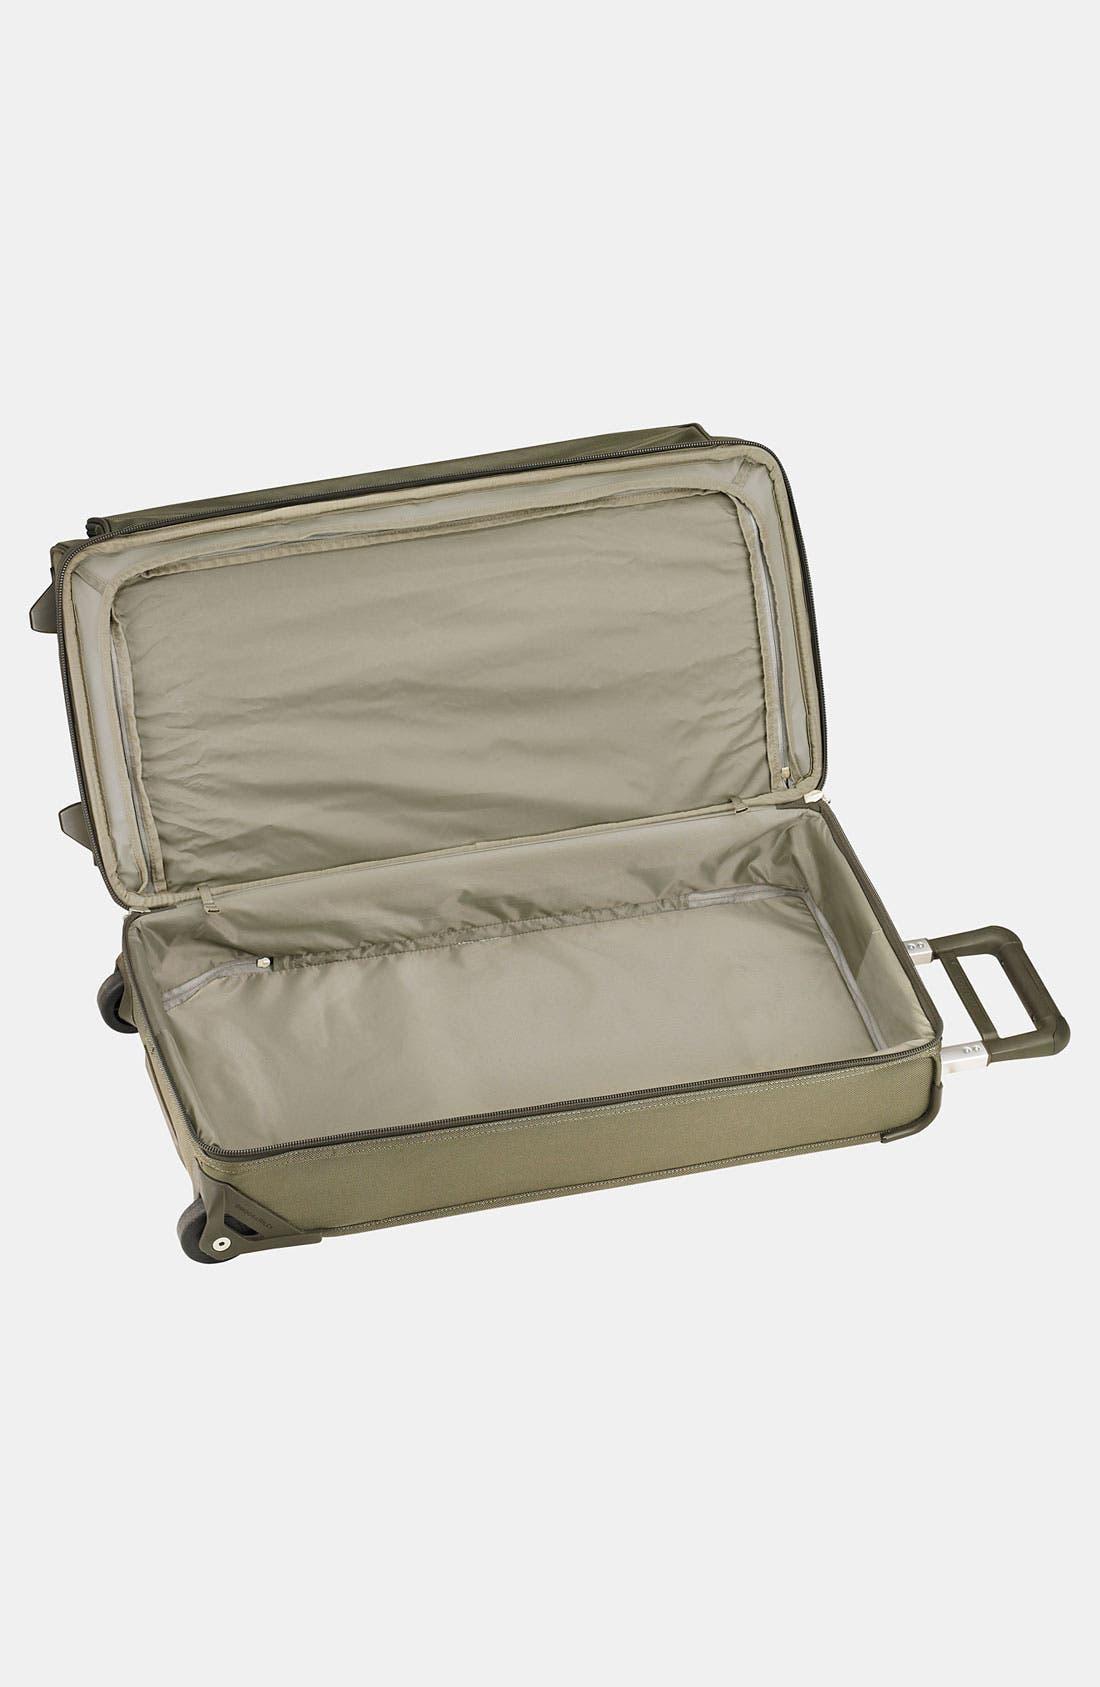 Alternate Image 3  - Briggs & Riley 'Large Baseline' Rolling Duffel Bag (29 Inch)